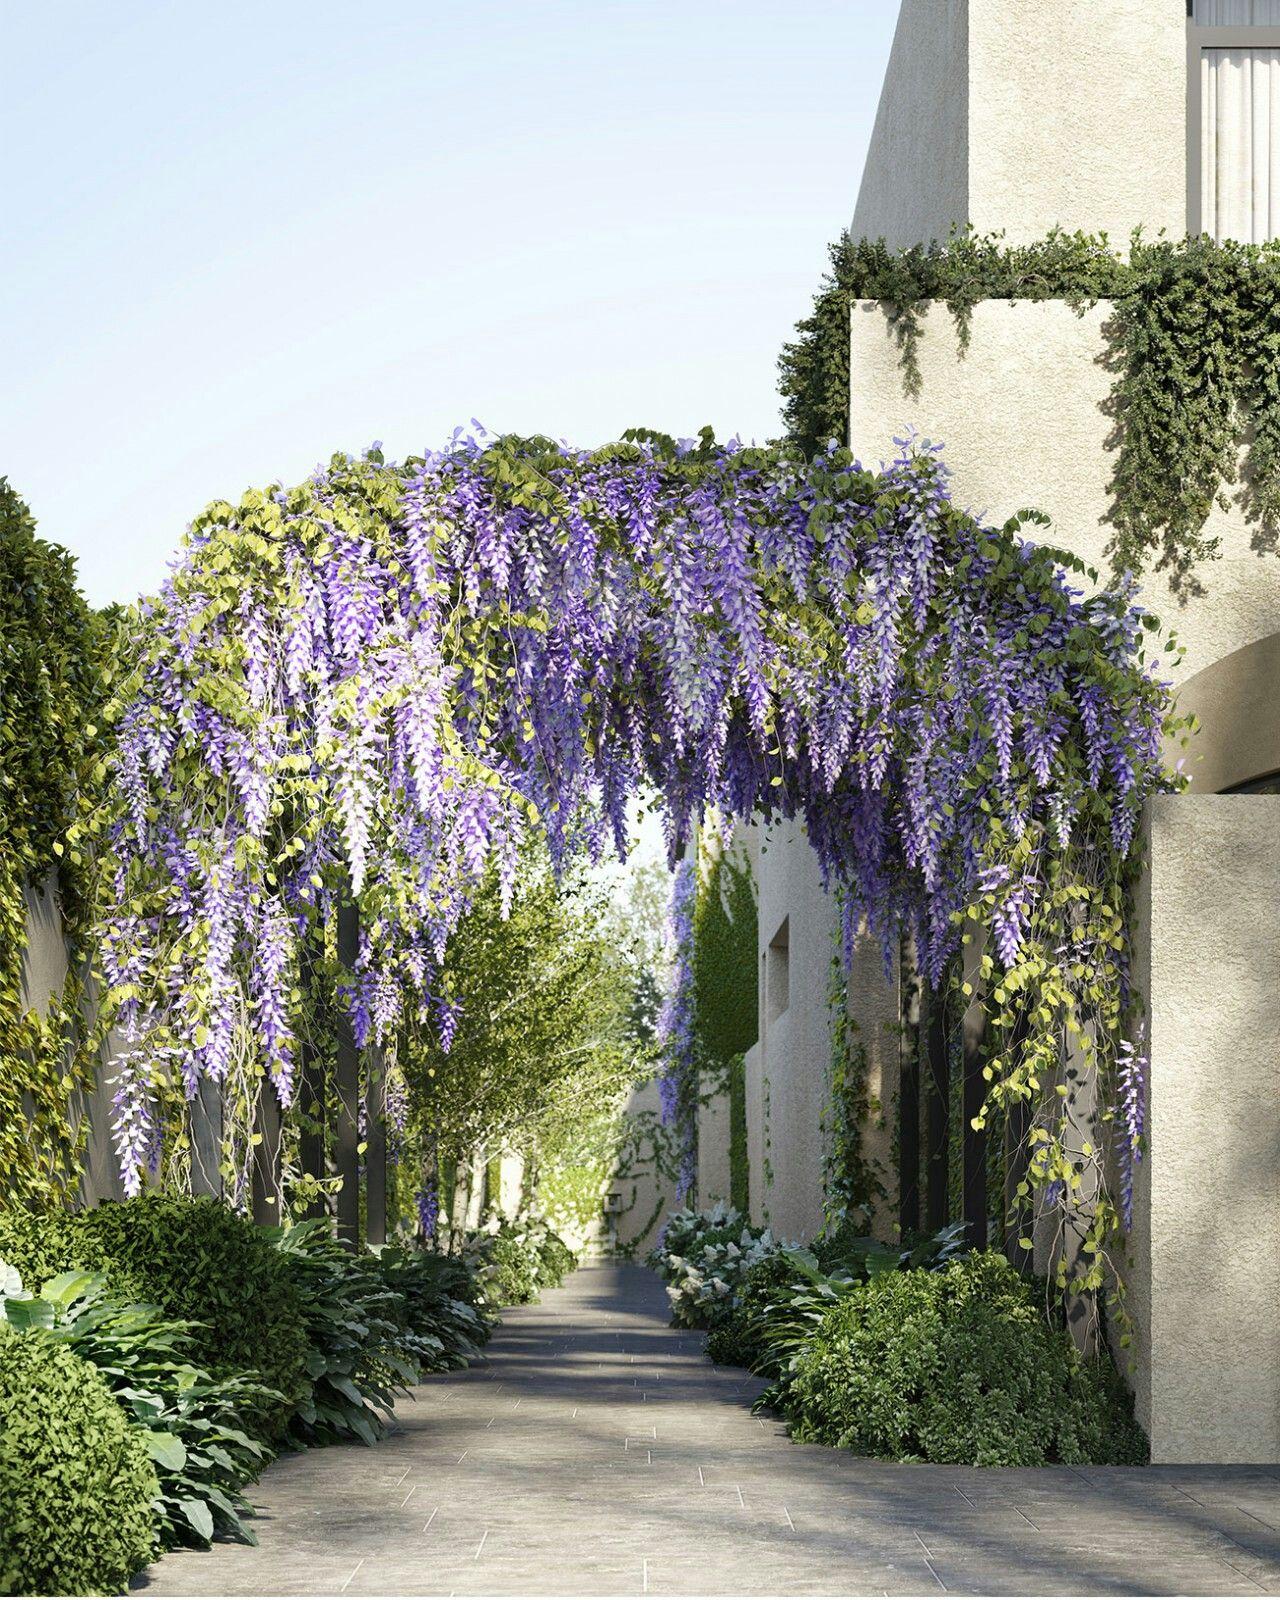 Jolson Huntingtower Road Glyzinie Blauregen Torbogen Blauregen Pflanzen Garten Landschaftsdesign